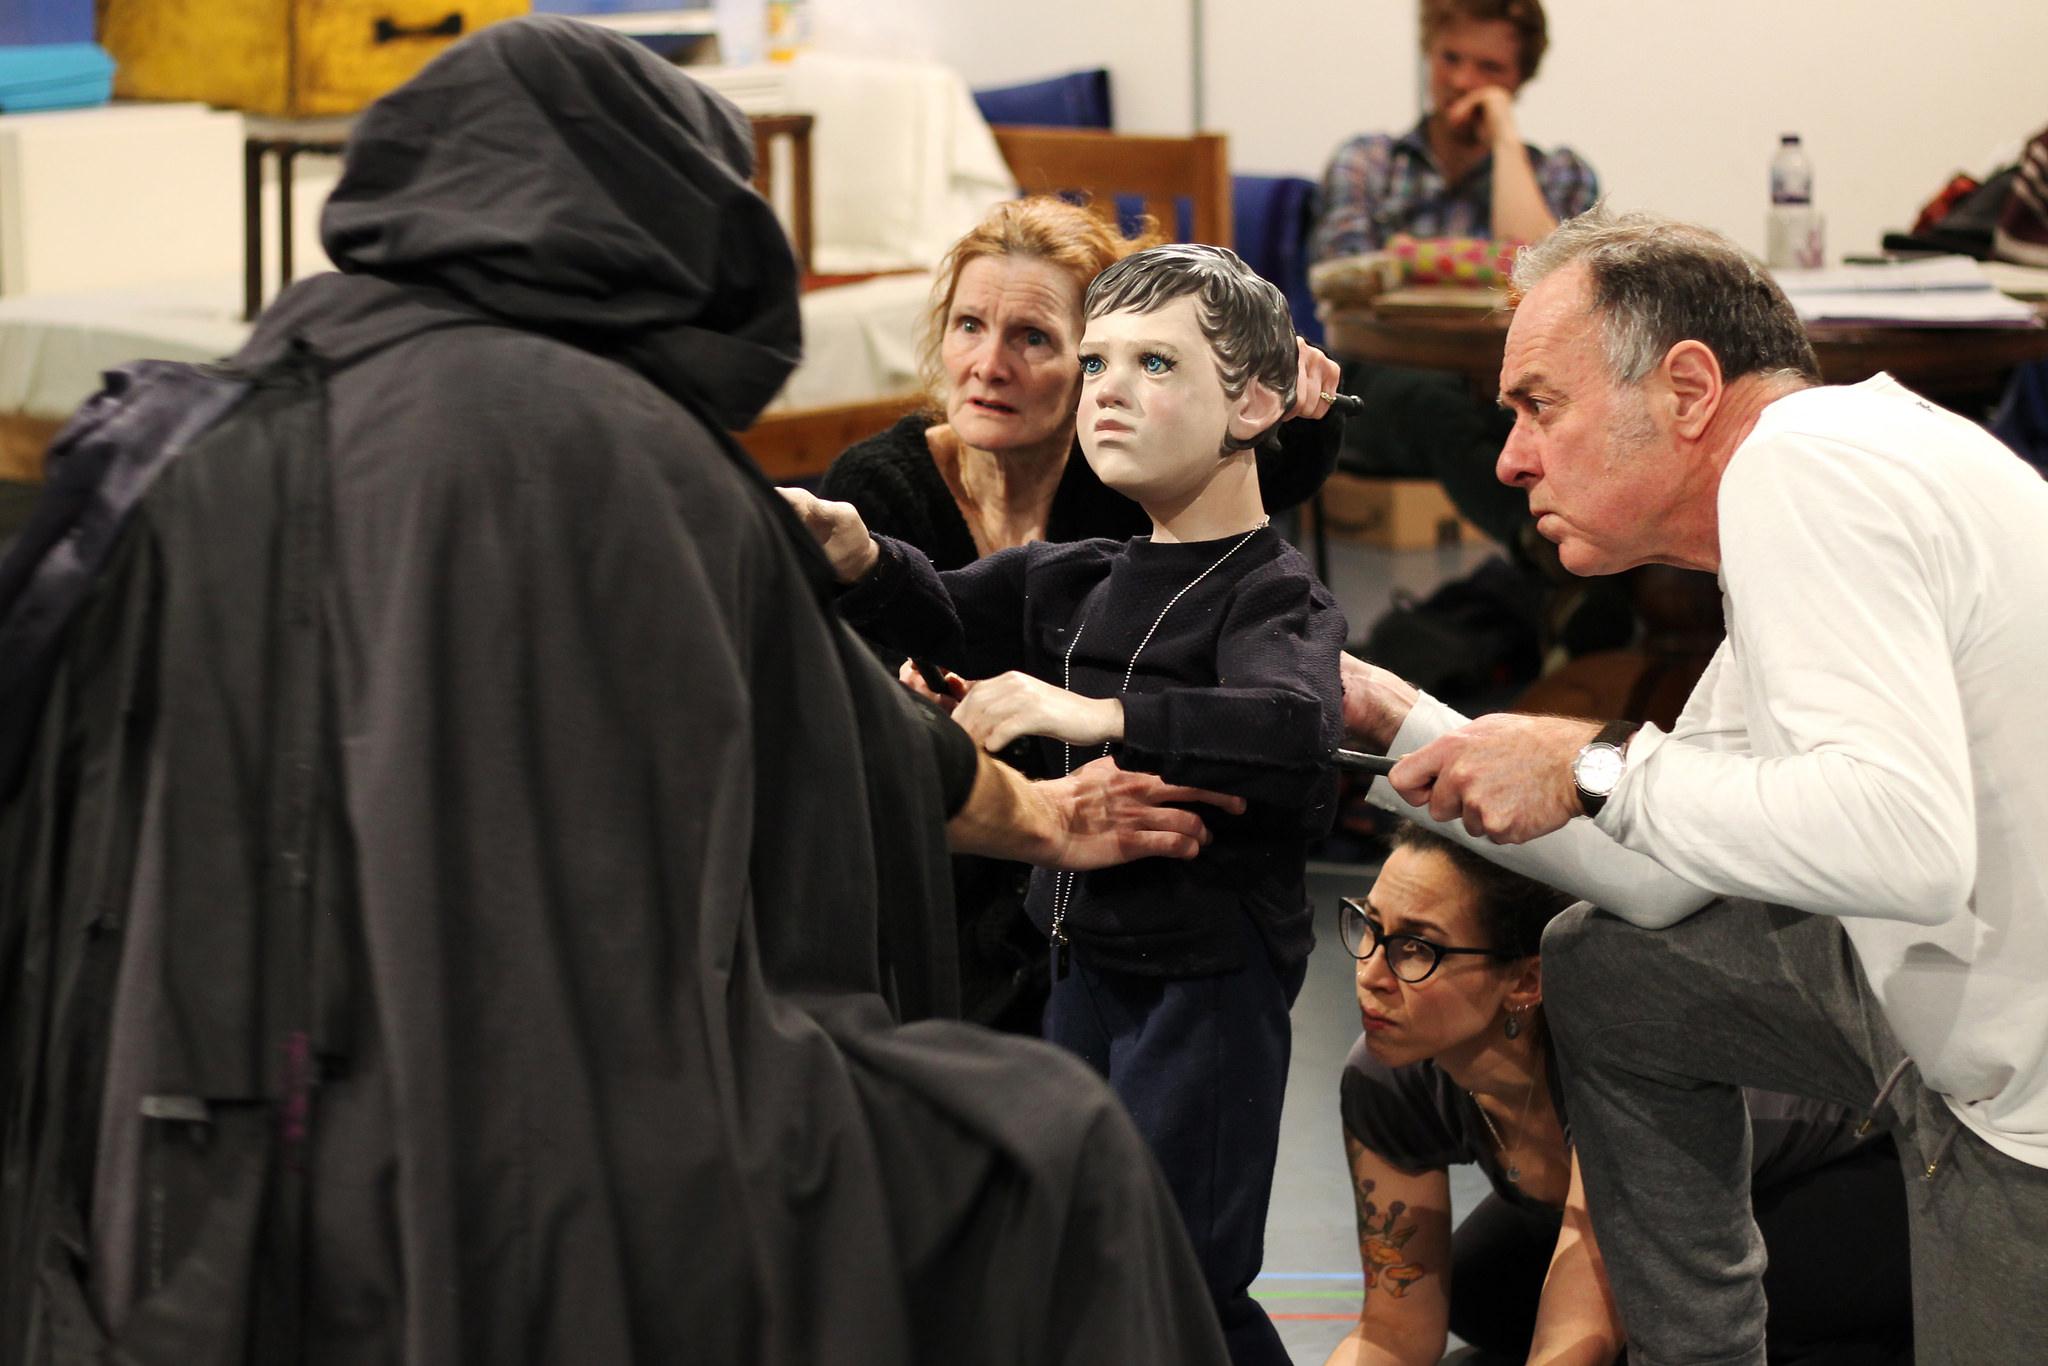 Nicola Sloane in Frankenstein